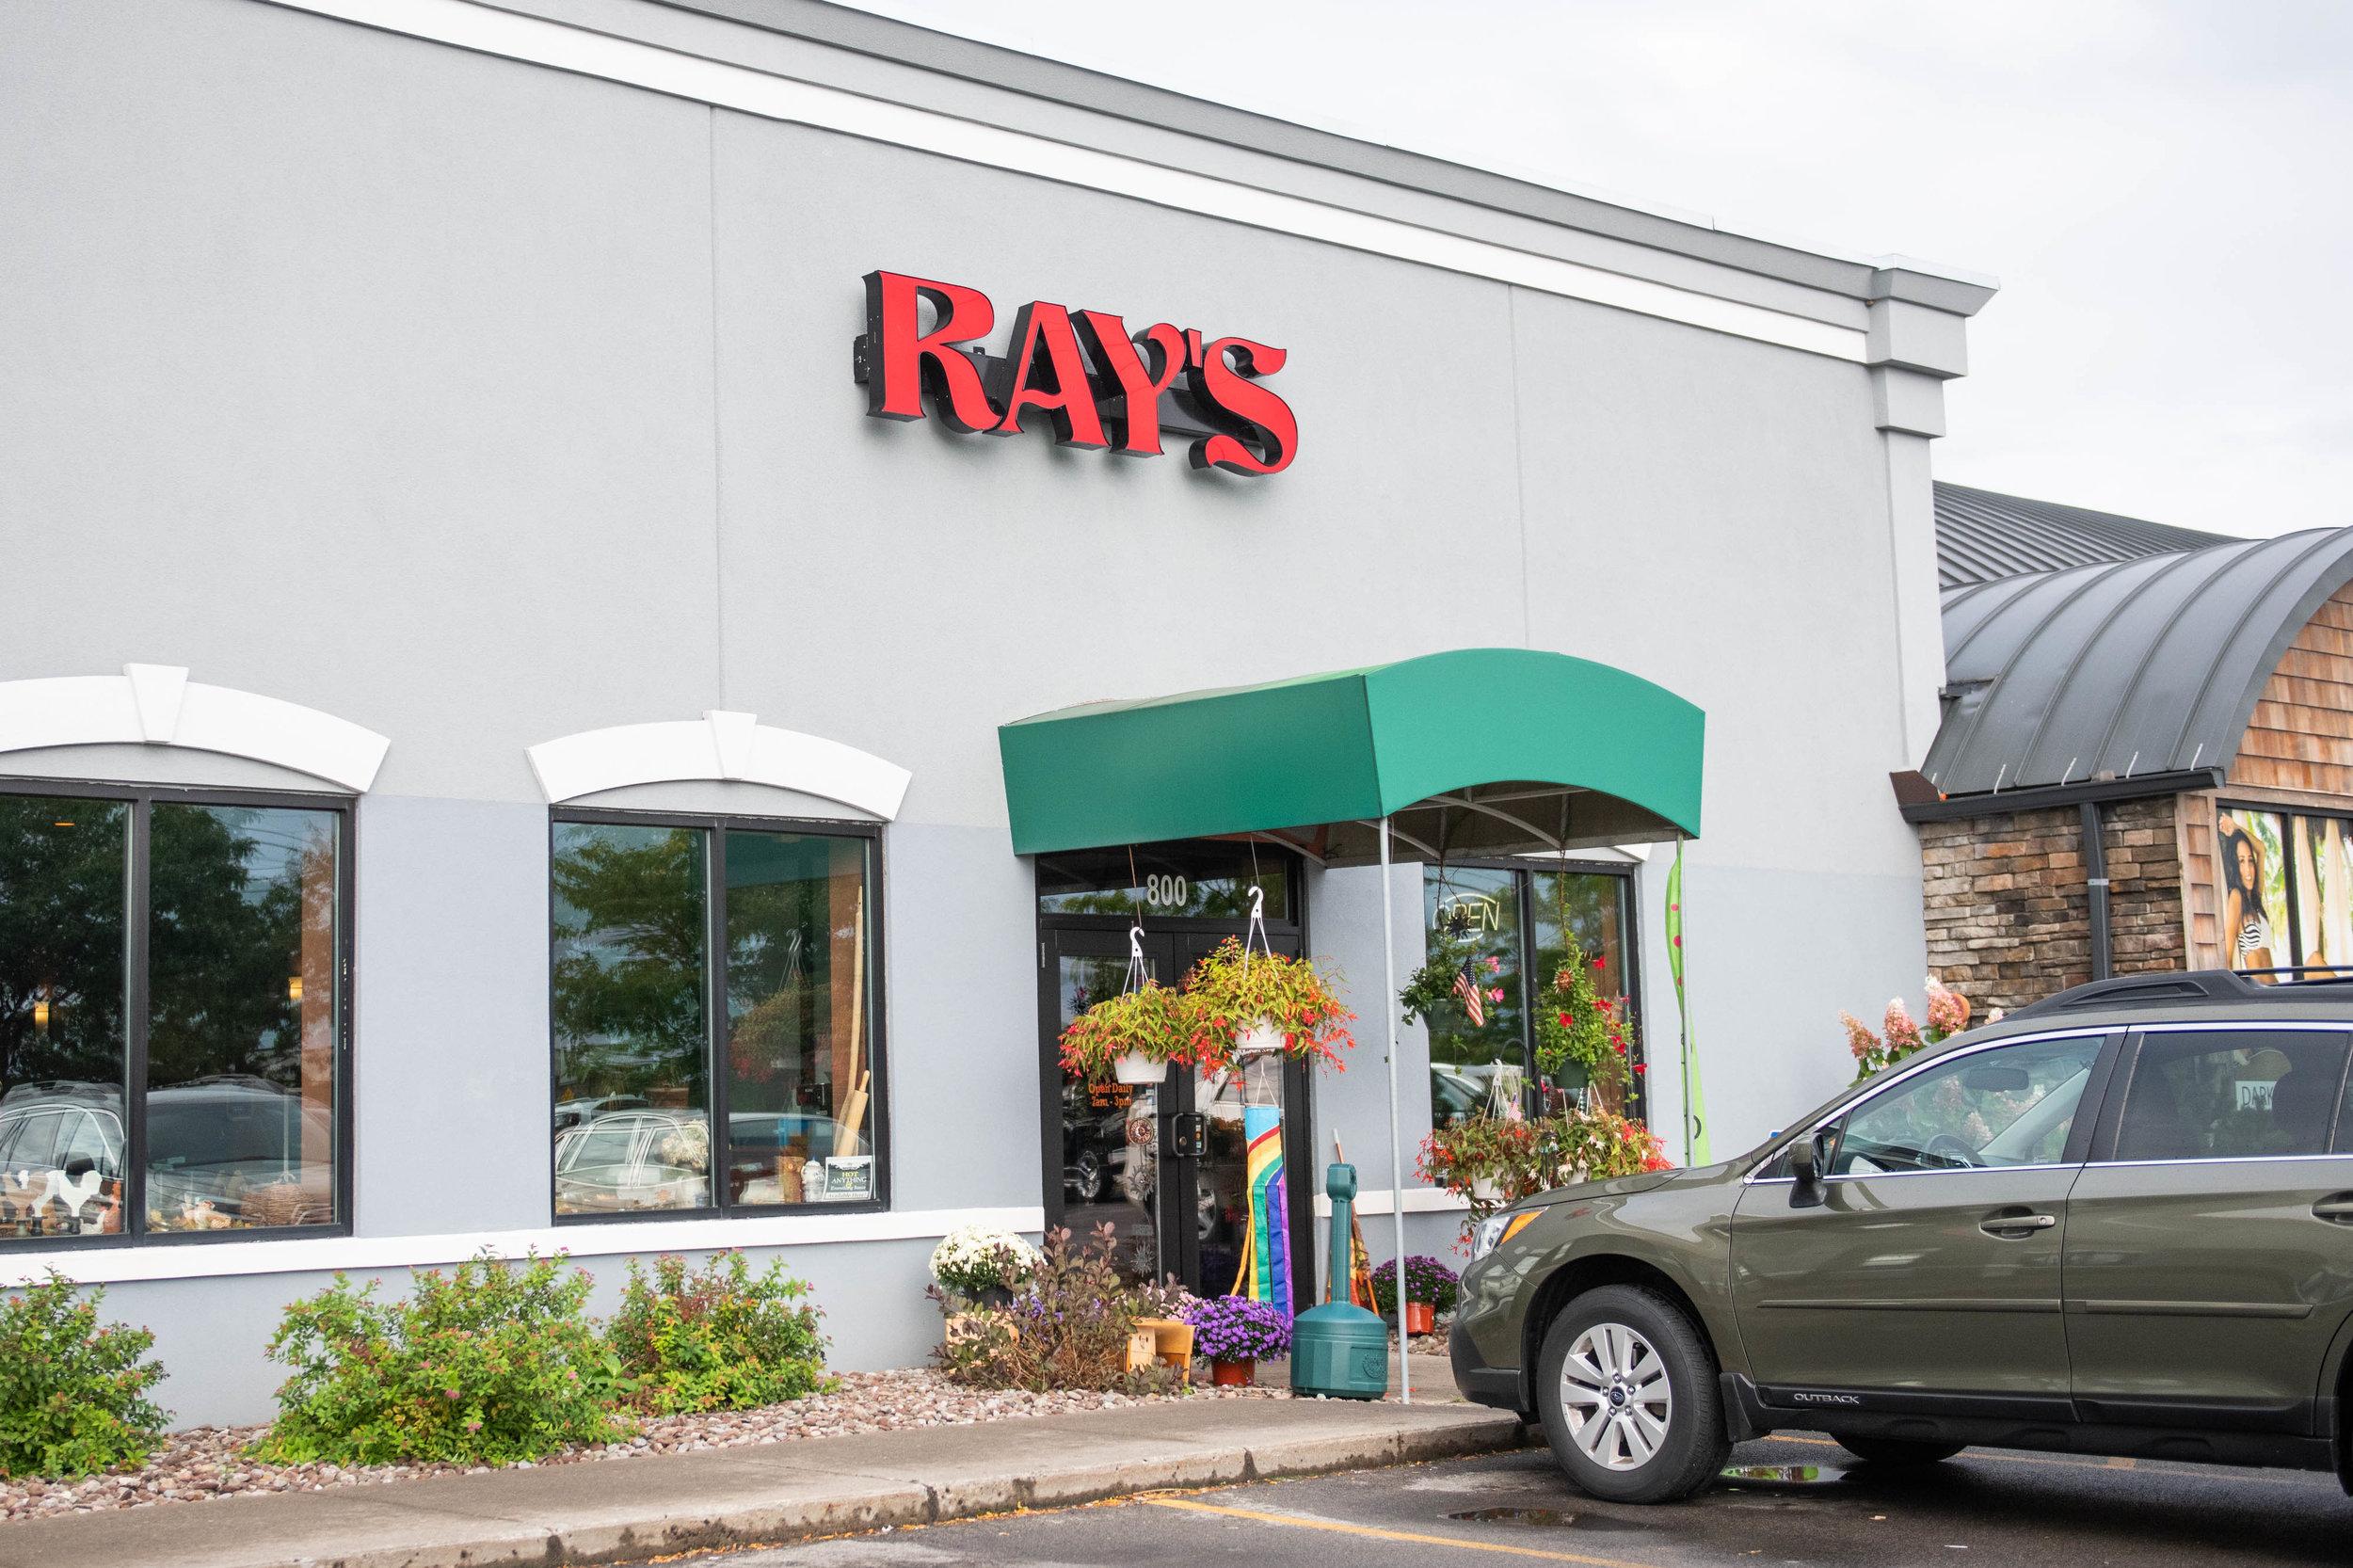 rays-canandaigua-GMP_00010-9d09a4de5056b3a_9d09a605-5056-b3a8-4913082382abdfbc.jpg